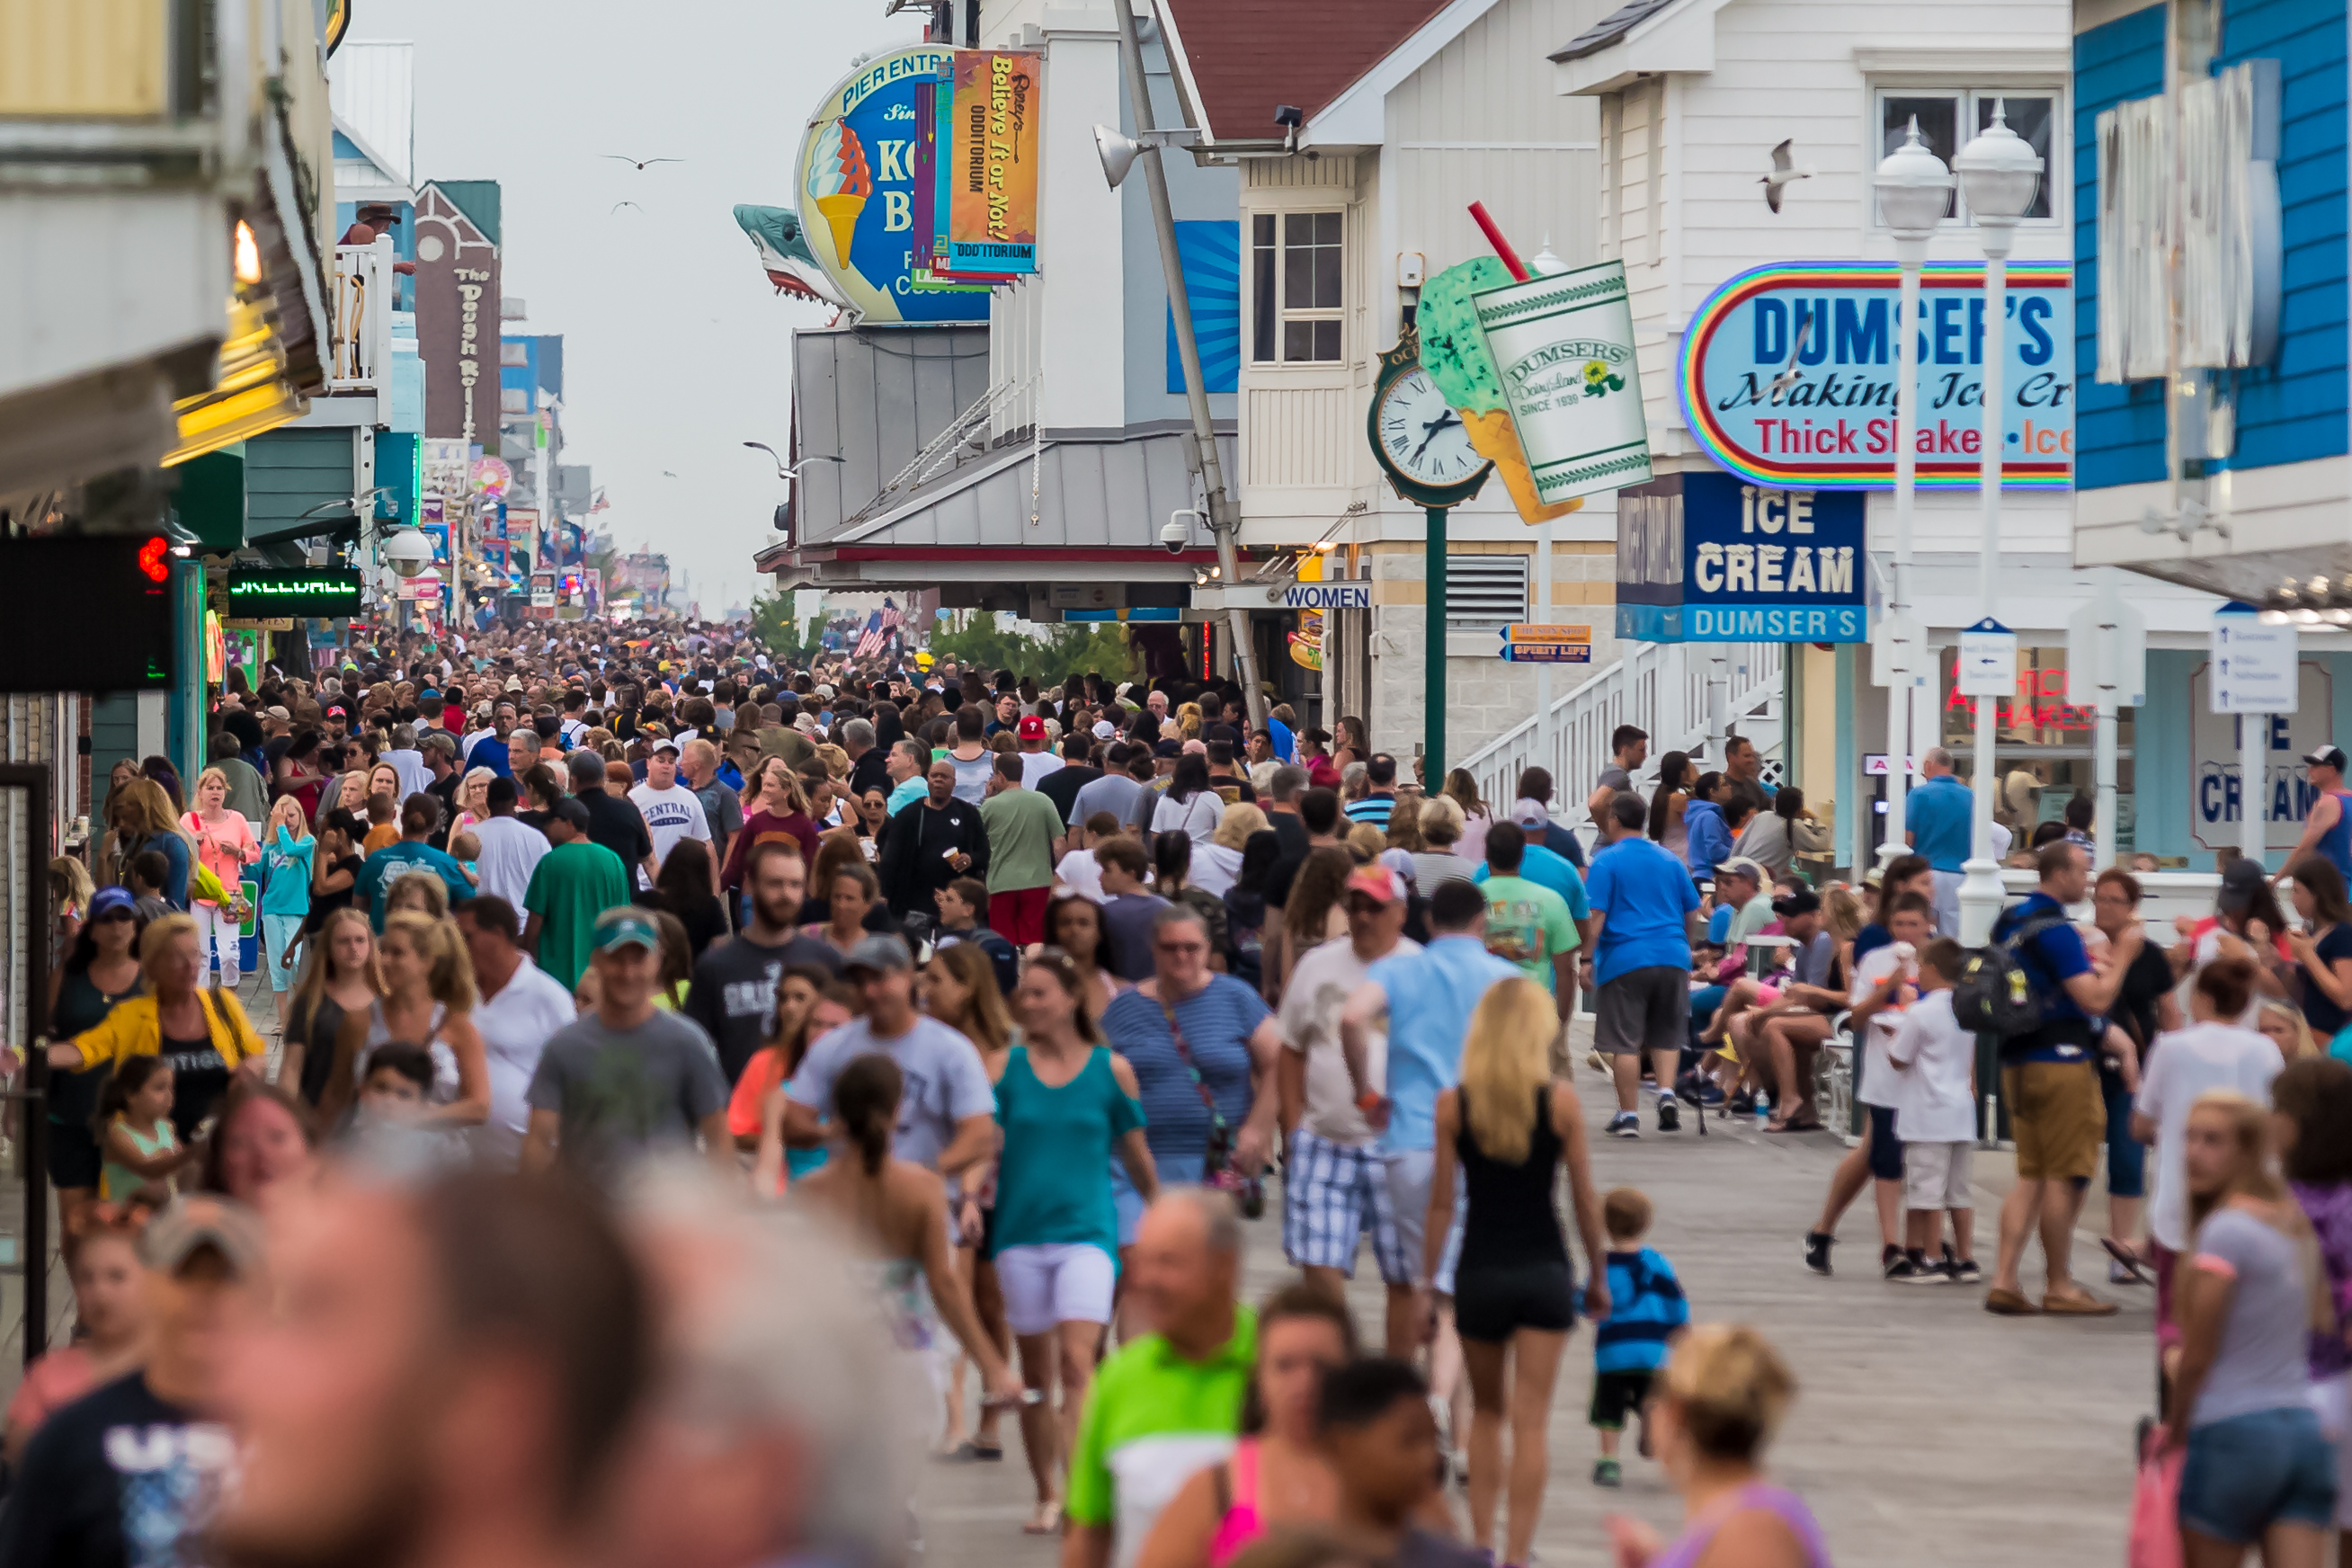 Officials Support New Enforcement Signs On Boardwalk